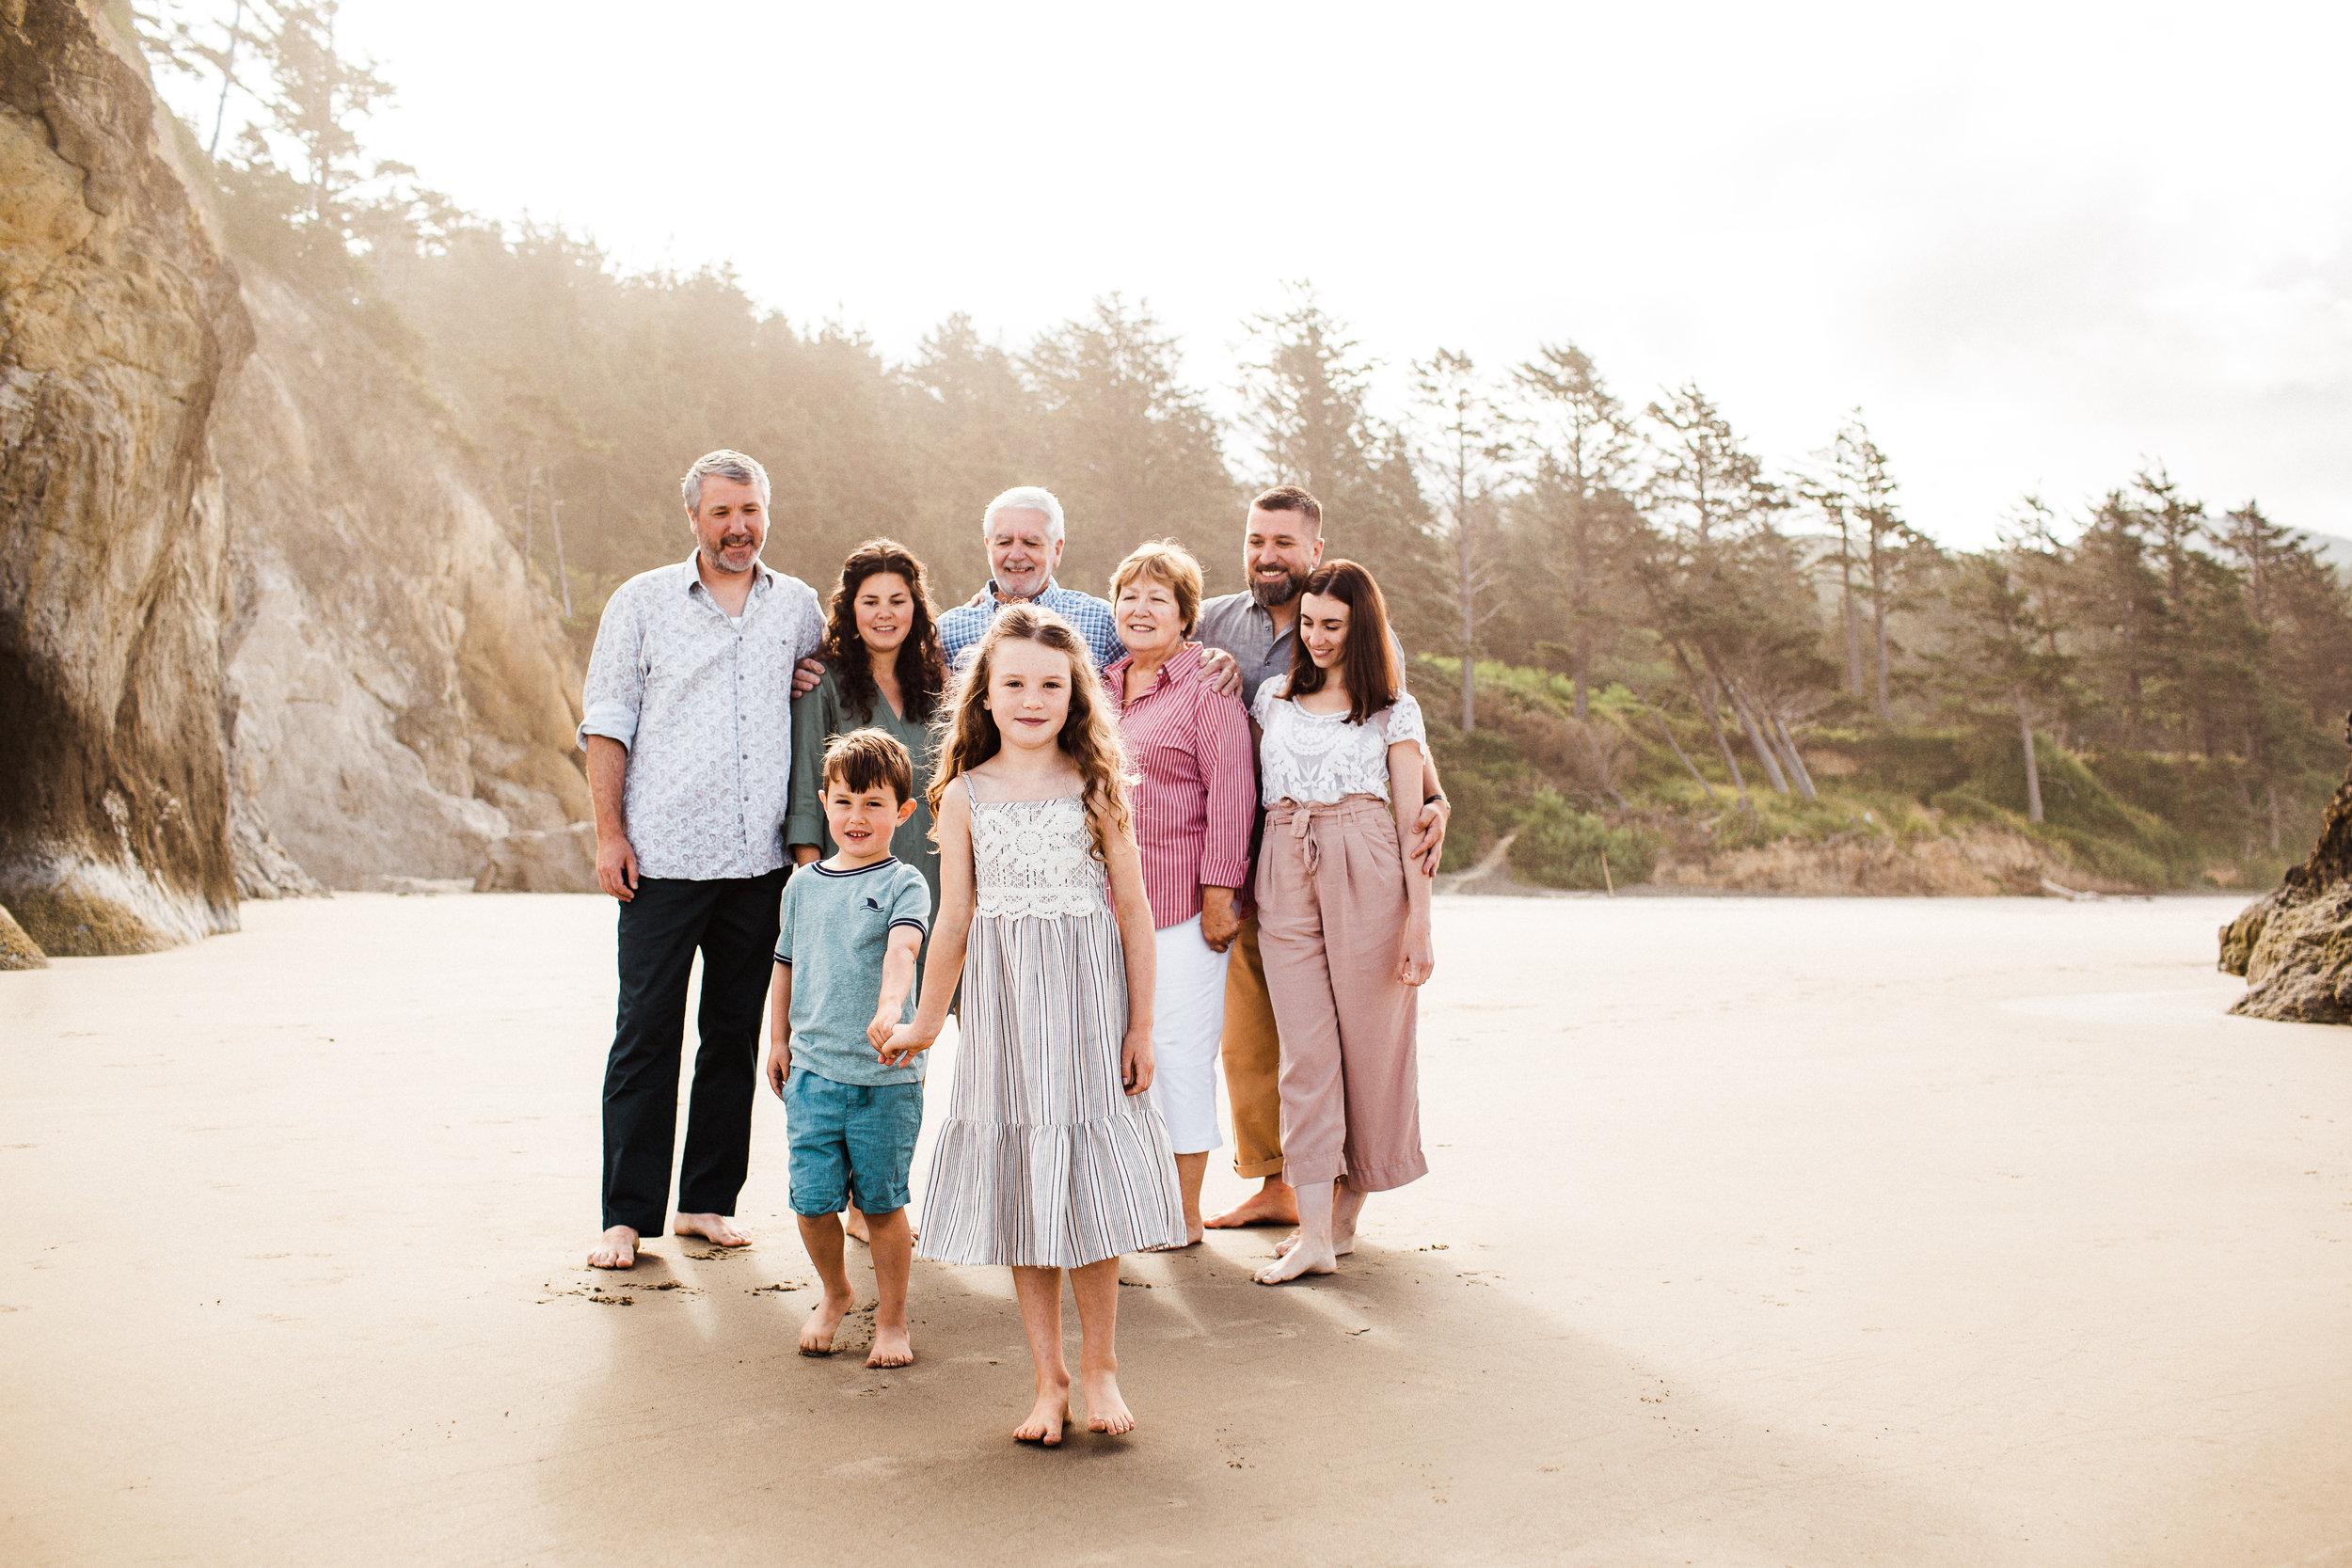 Barrie family - Cannon Beach, OR